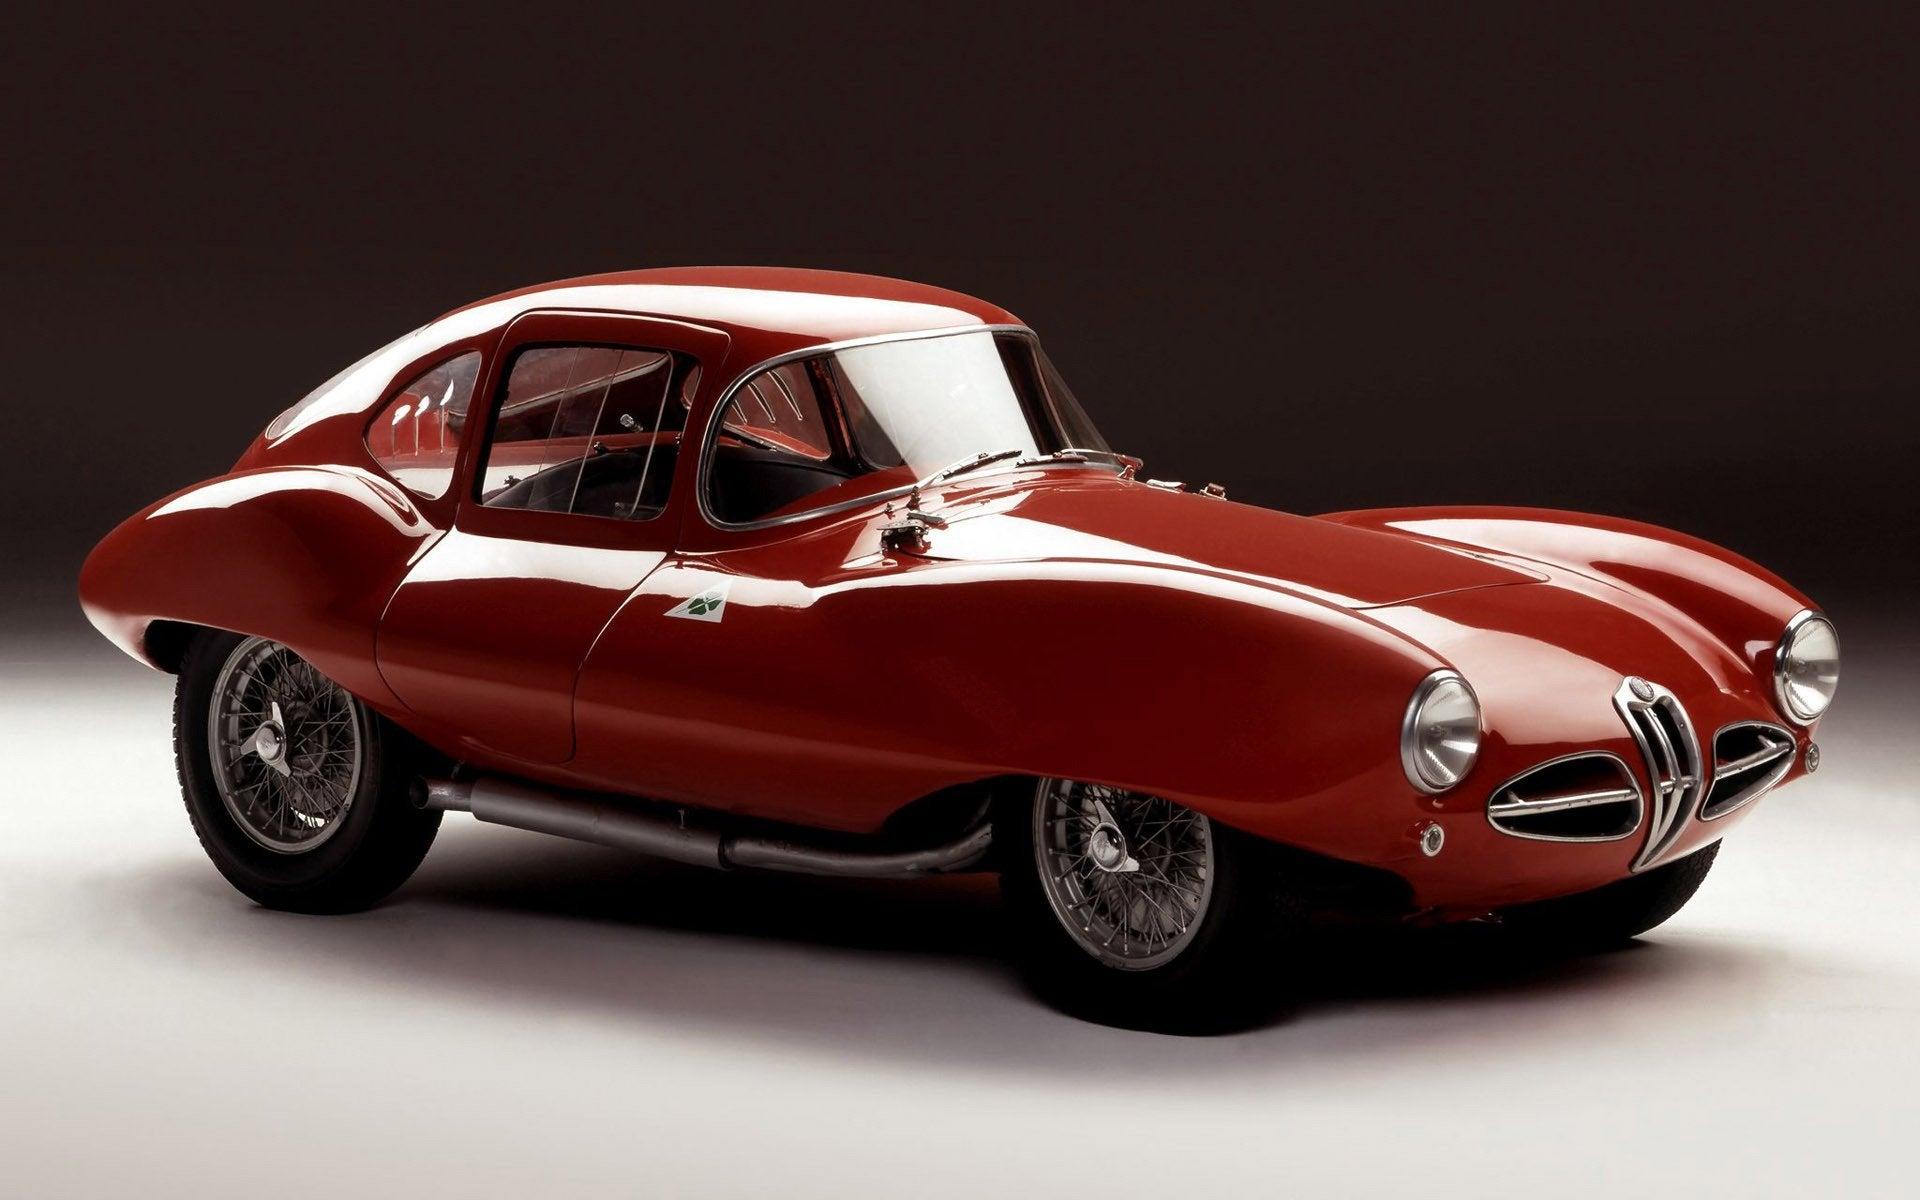 Clásico: Alfa Romeo C52 Disco Volante 1952